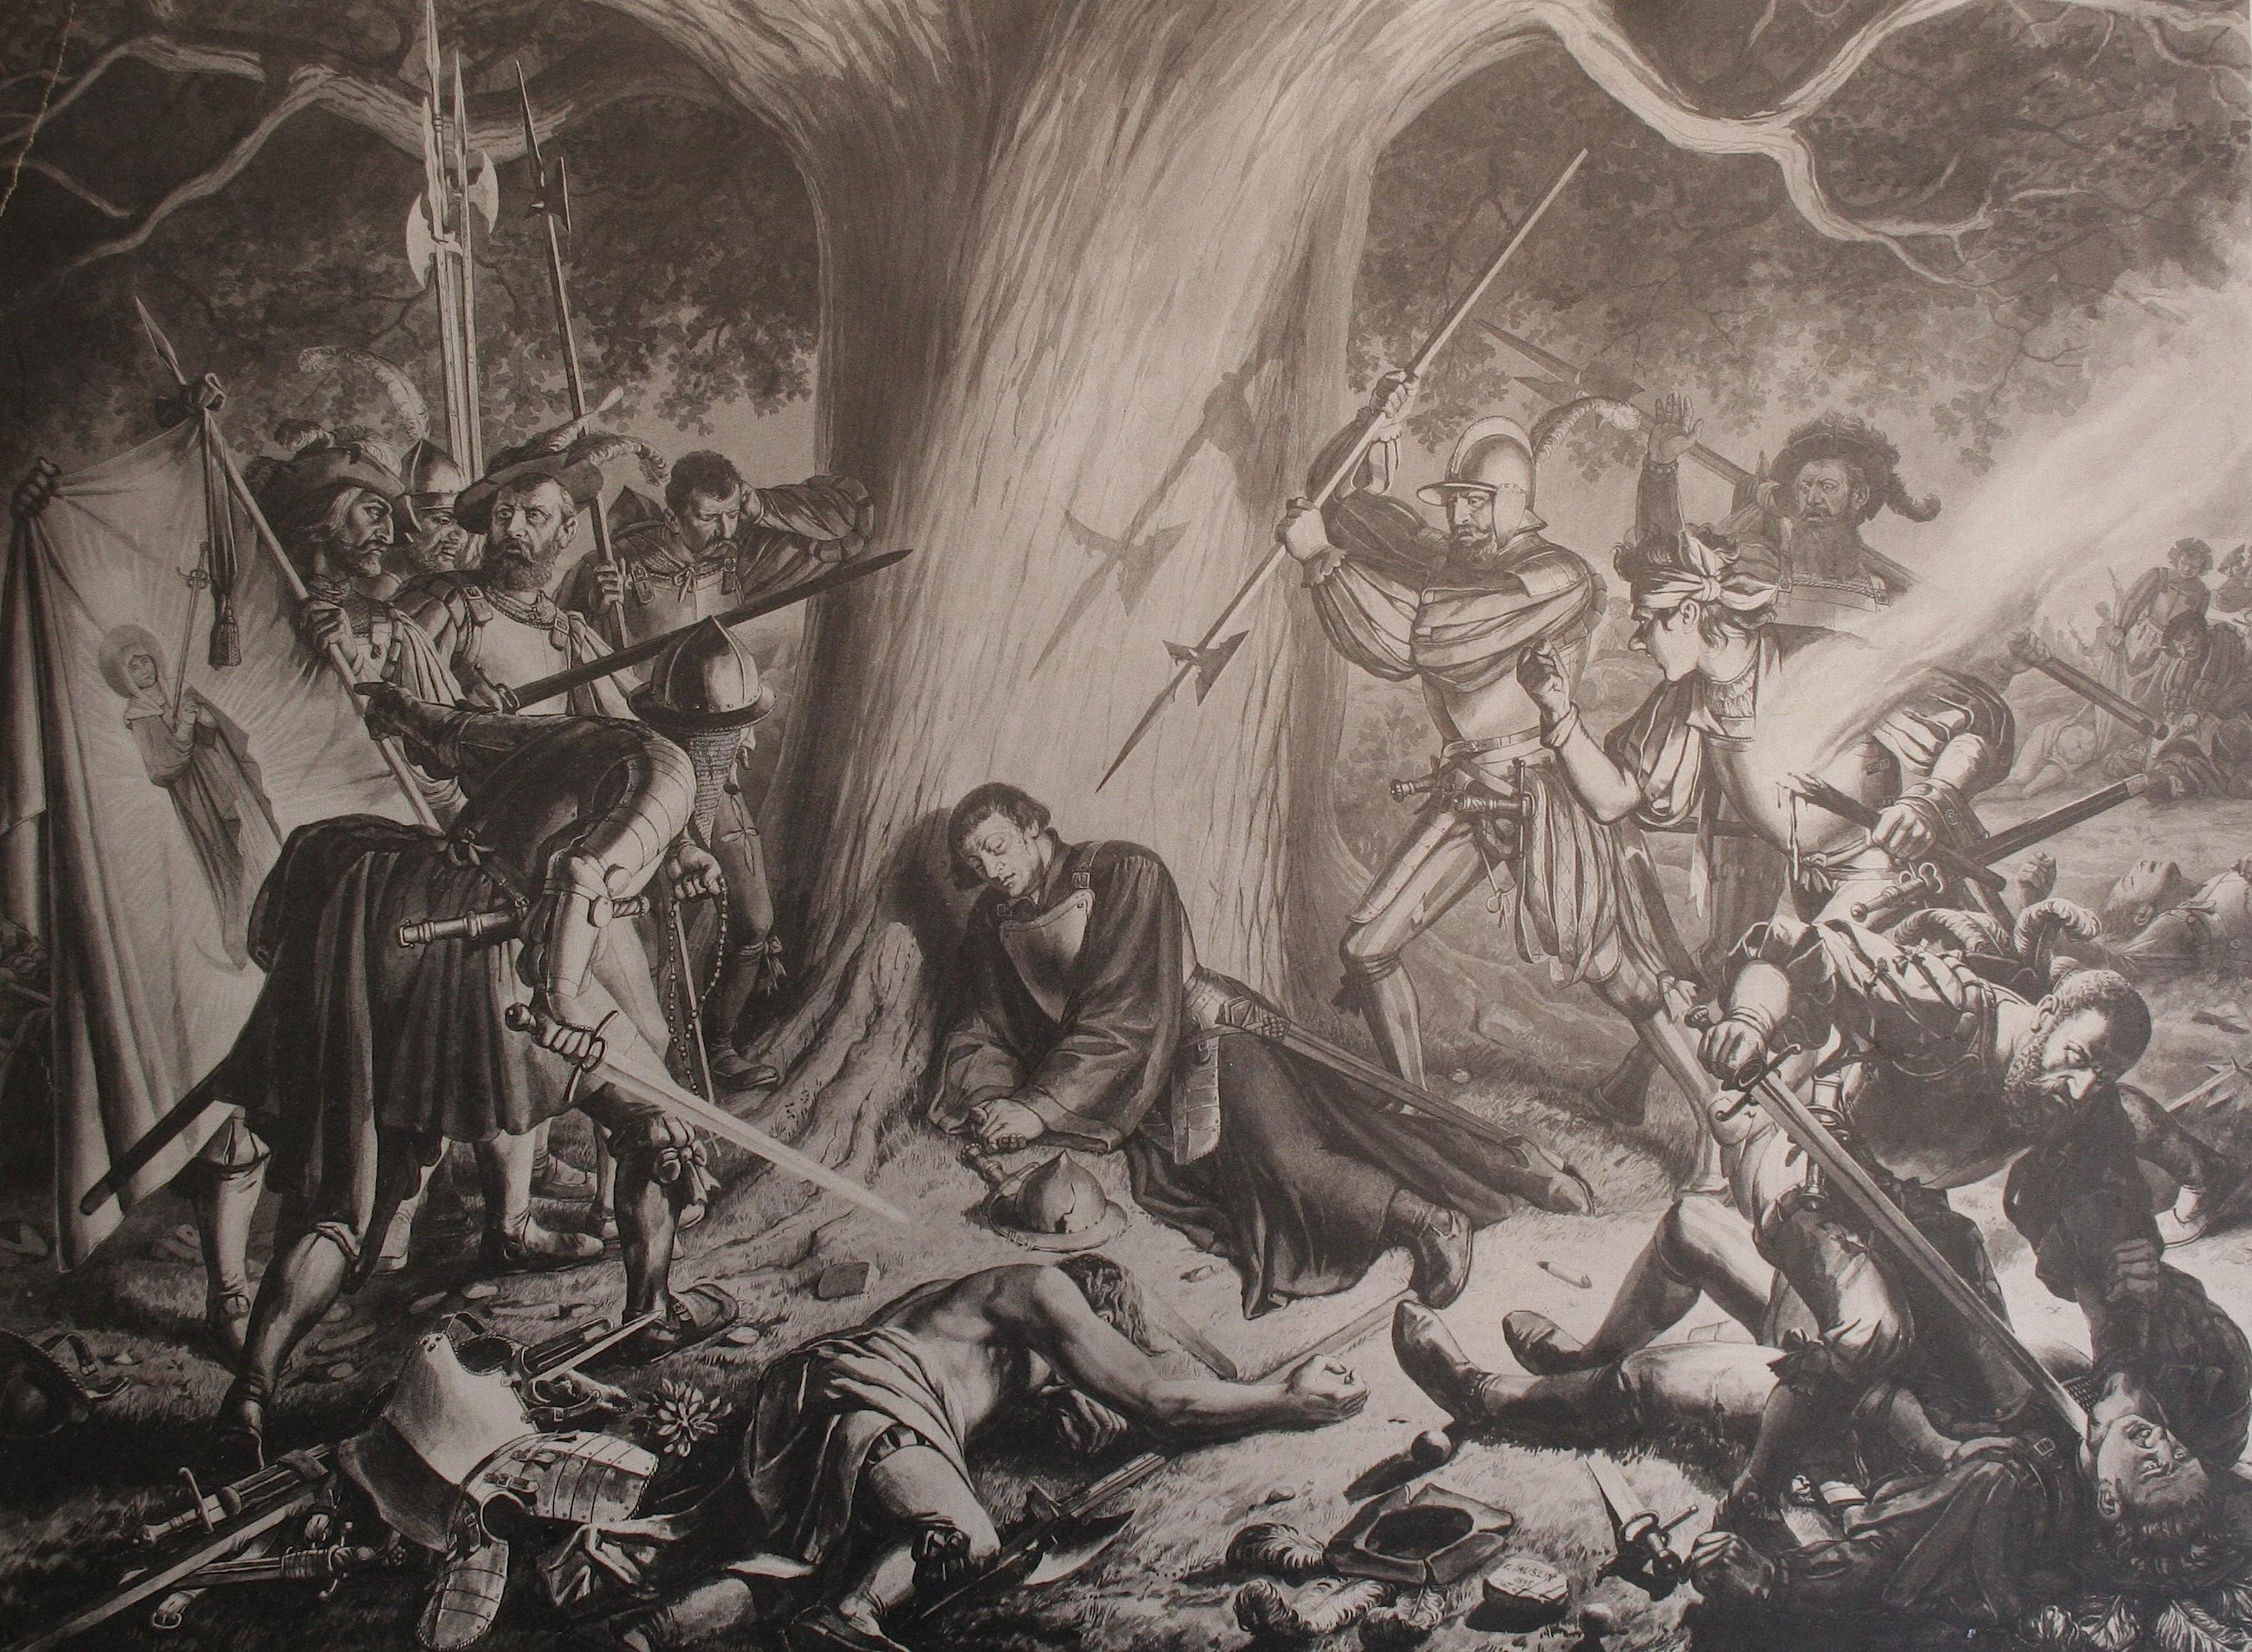 File:Ermordung Zwingli Jauslin.JPG - Wikimedia Commons